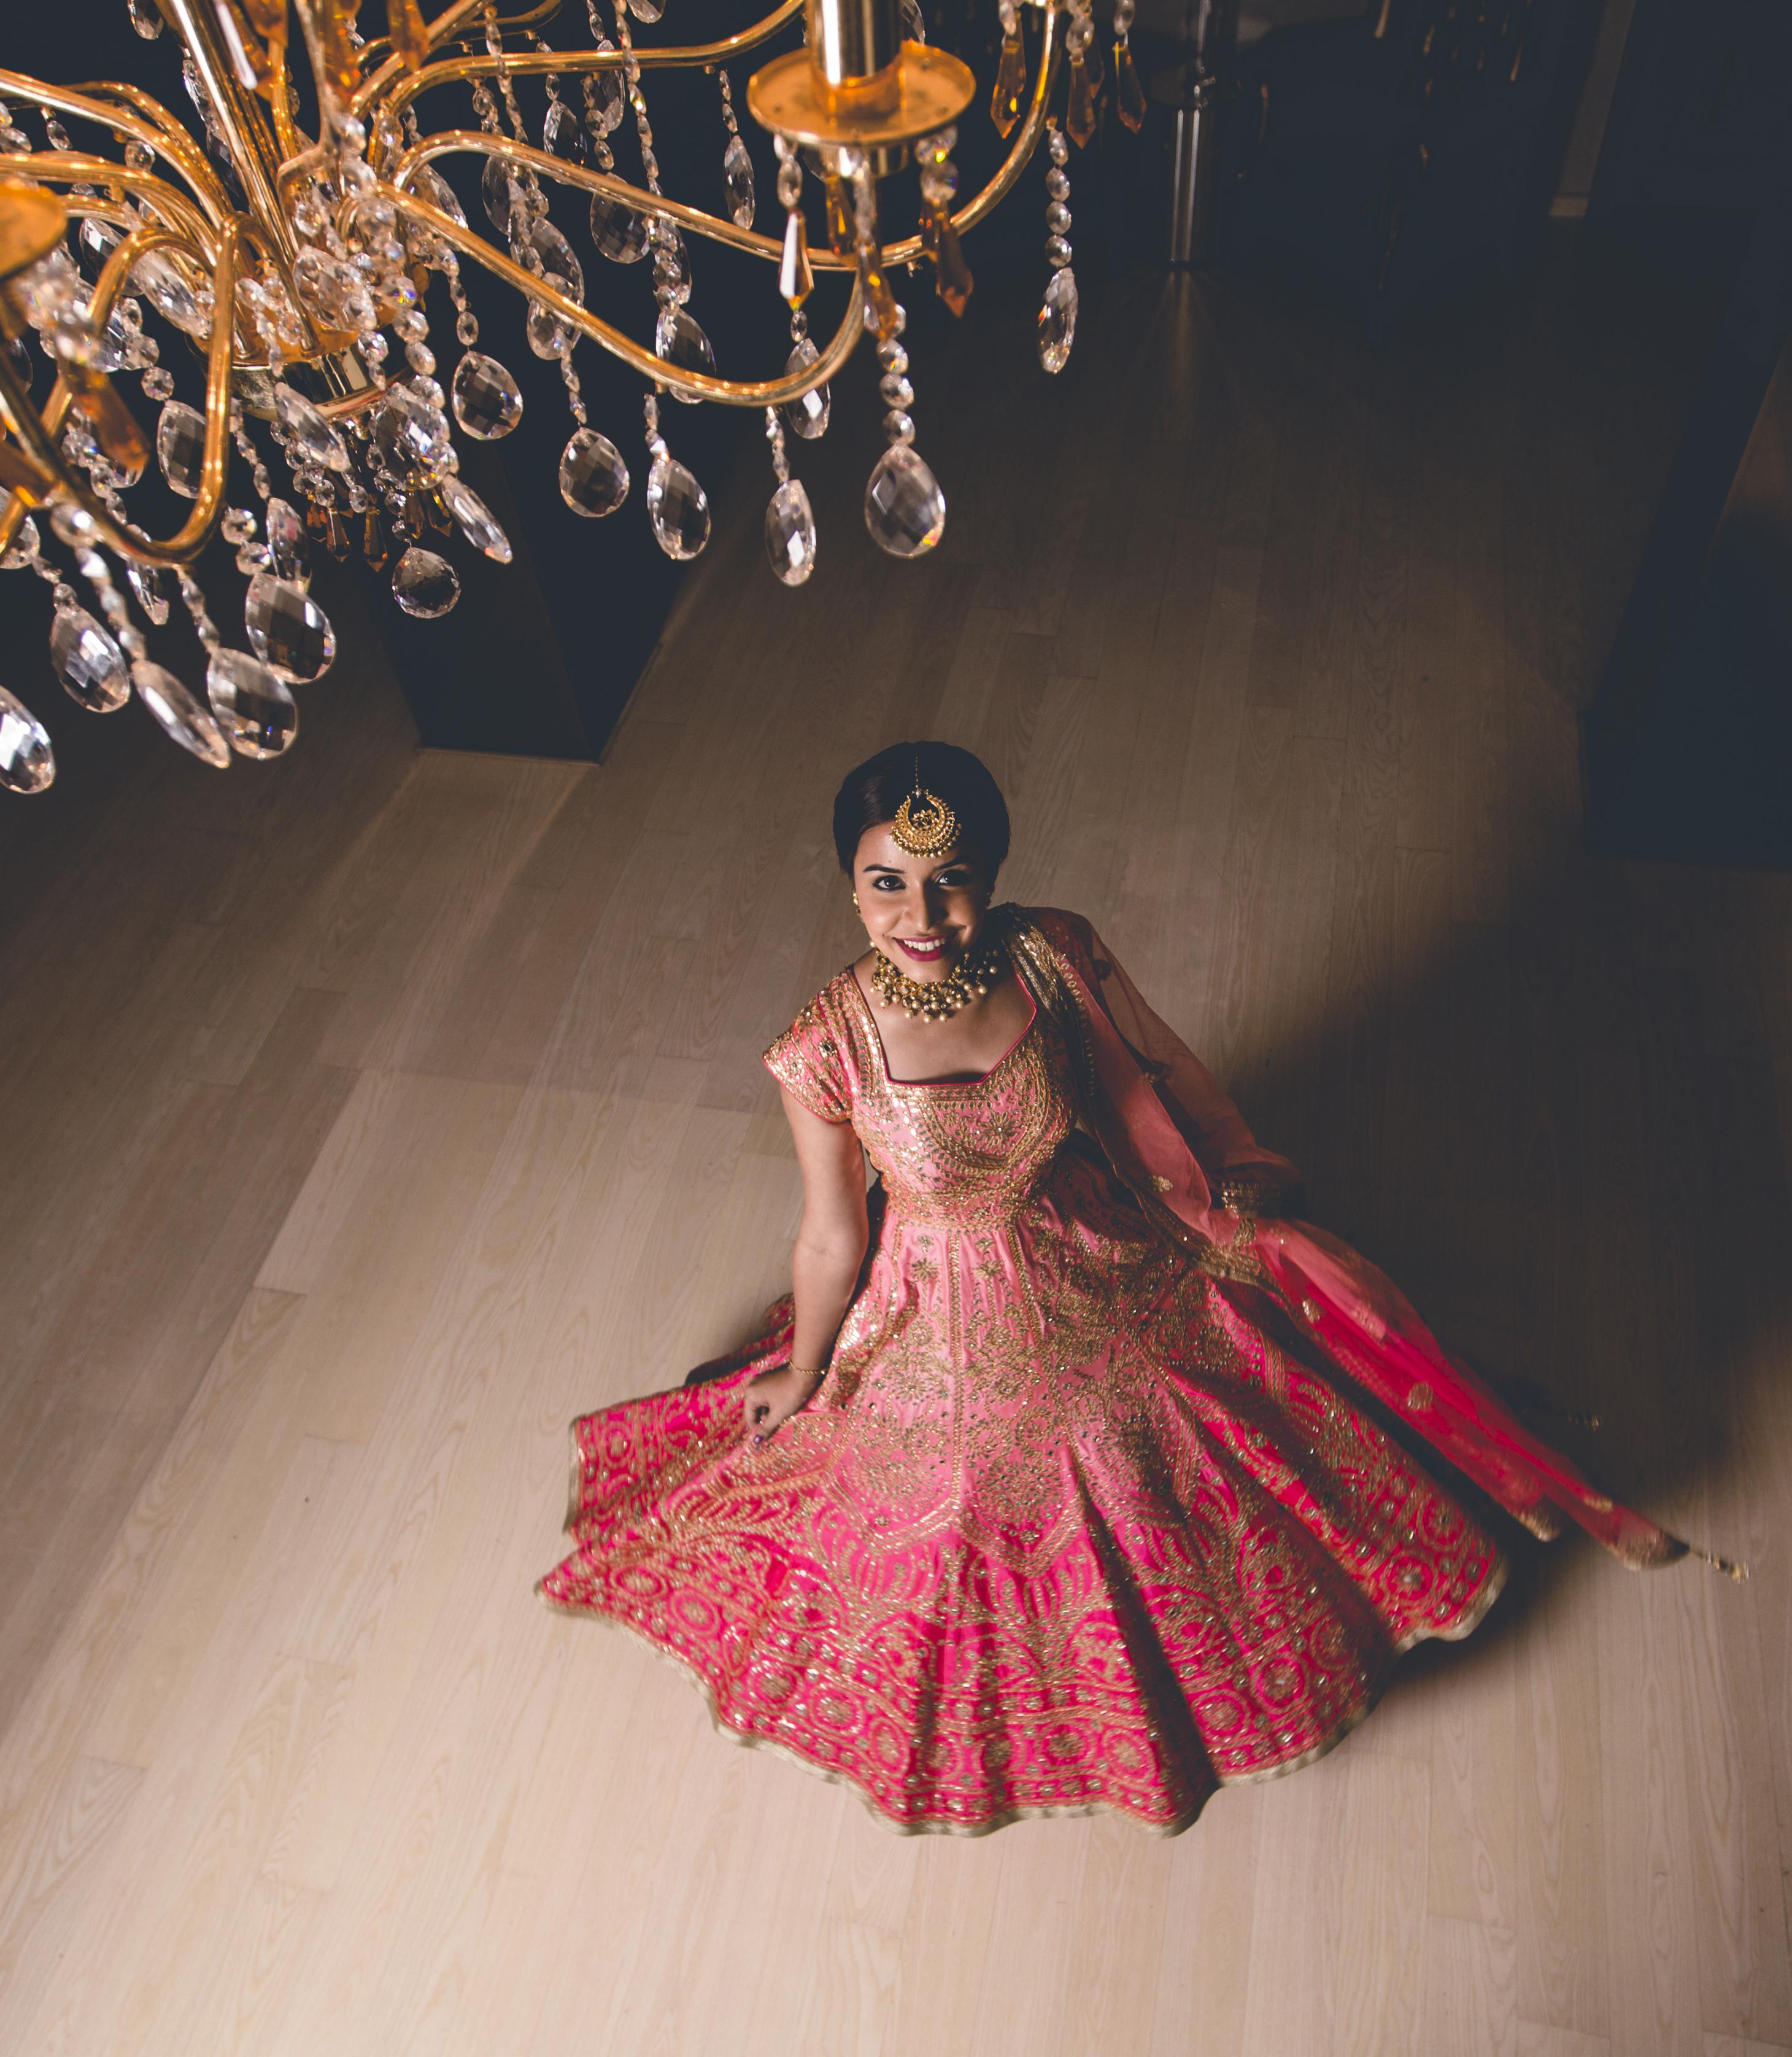 rent dresses online, fashion rental site, lehenga